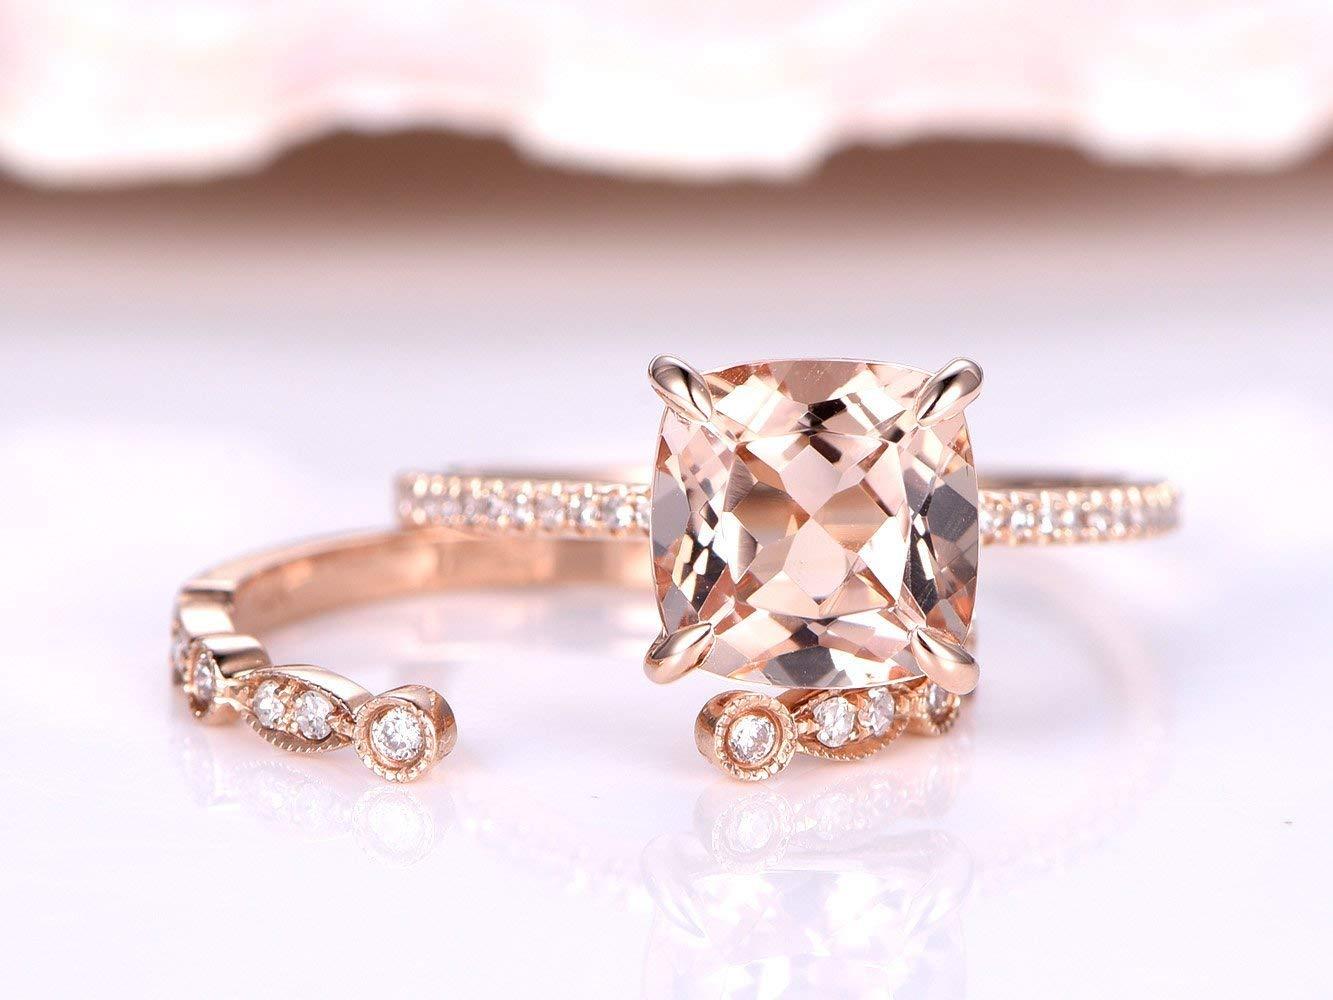 2 Solid 14k Rose Gold Morganite Rings Jewelry Set,8x8mm Cushion Cut Natural Pink Morganite Claw Diamond Thin Band Ring,Marquise Milgrain Vintage Art Deco Diamonds Wedding Propose Matching Band Sets